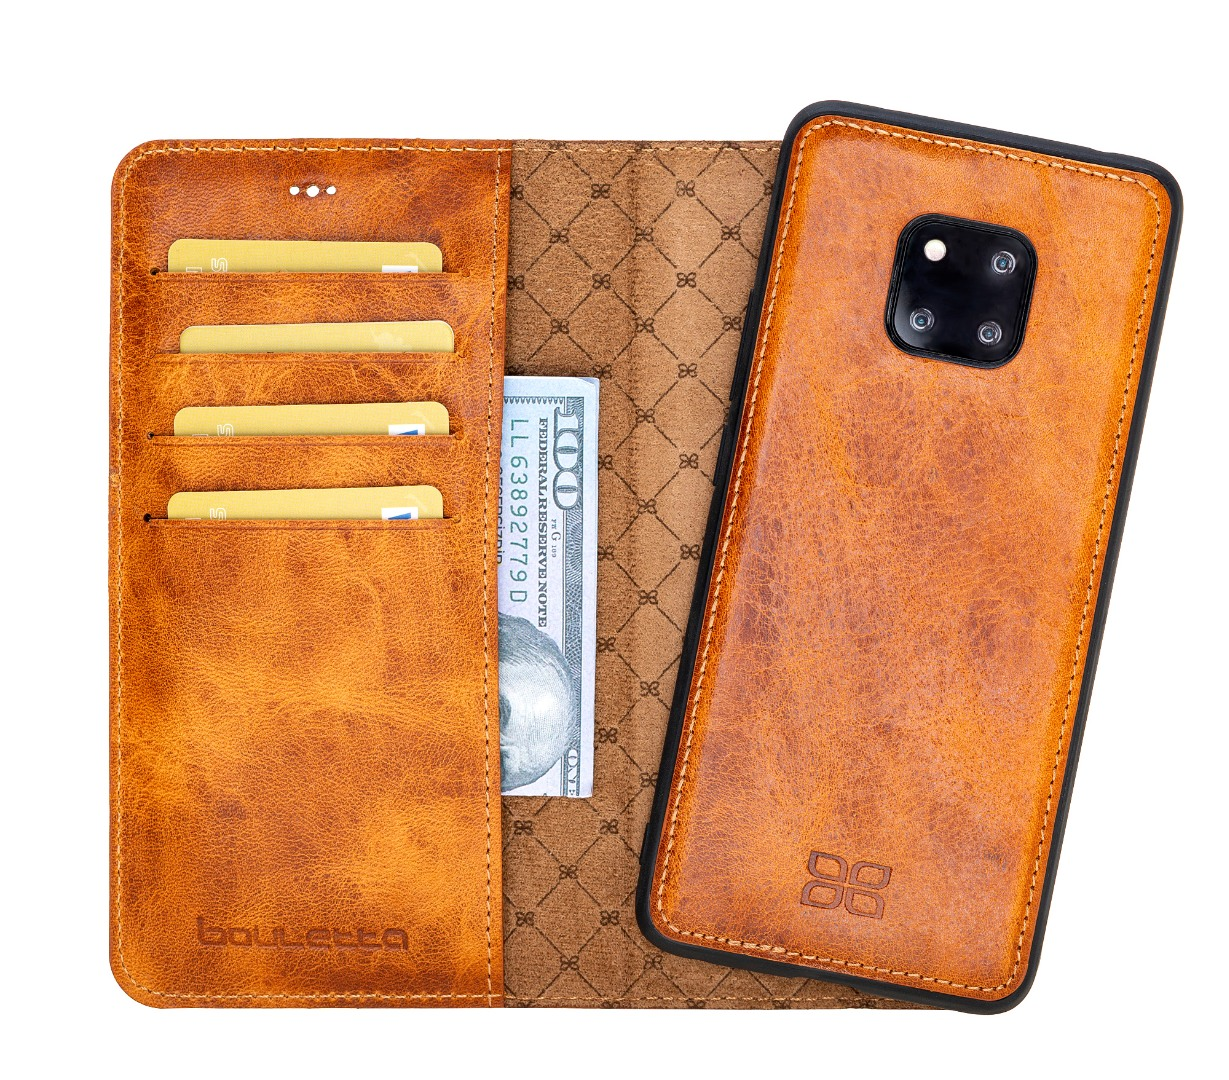 Husa piele naturala 2 in 1, tip portofel + back cover, Huawei Mate 20 Pro - Bouletta Magic Wallet, Tan